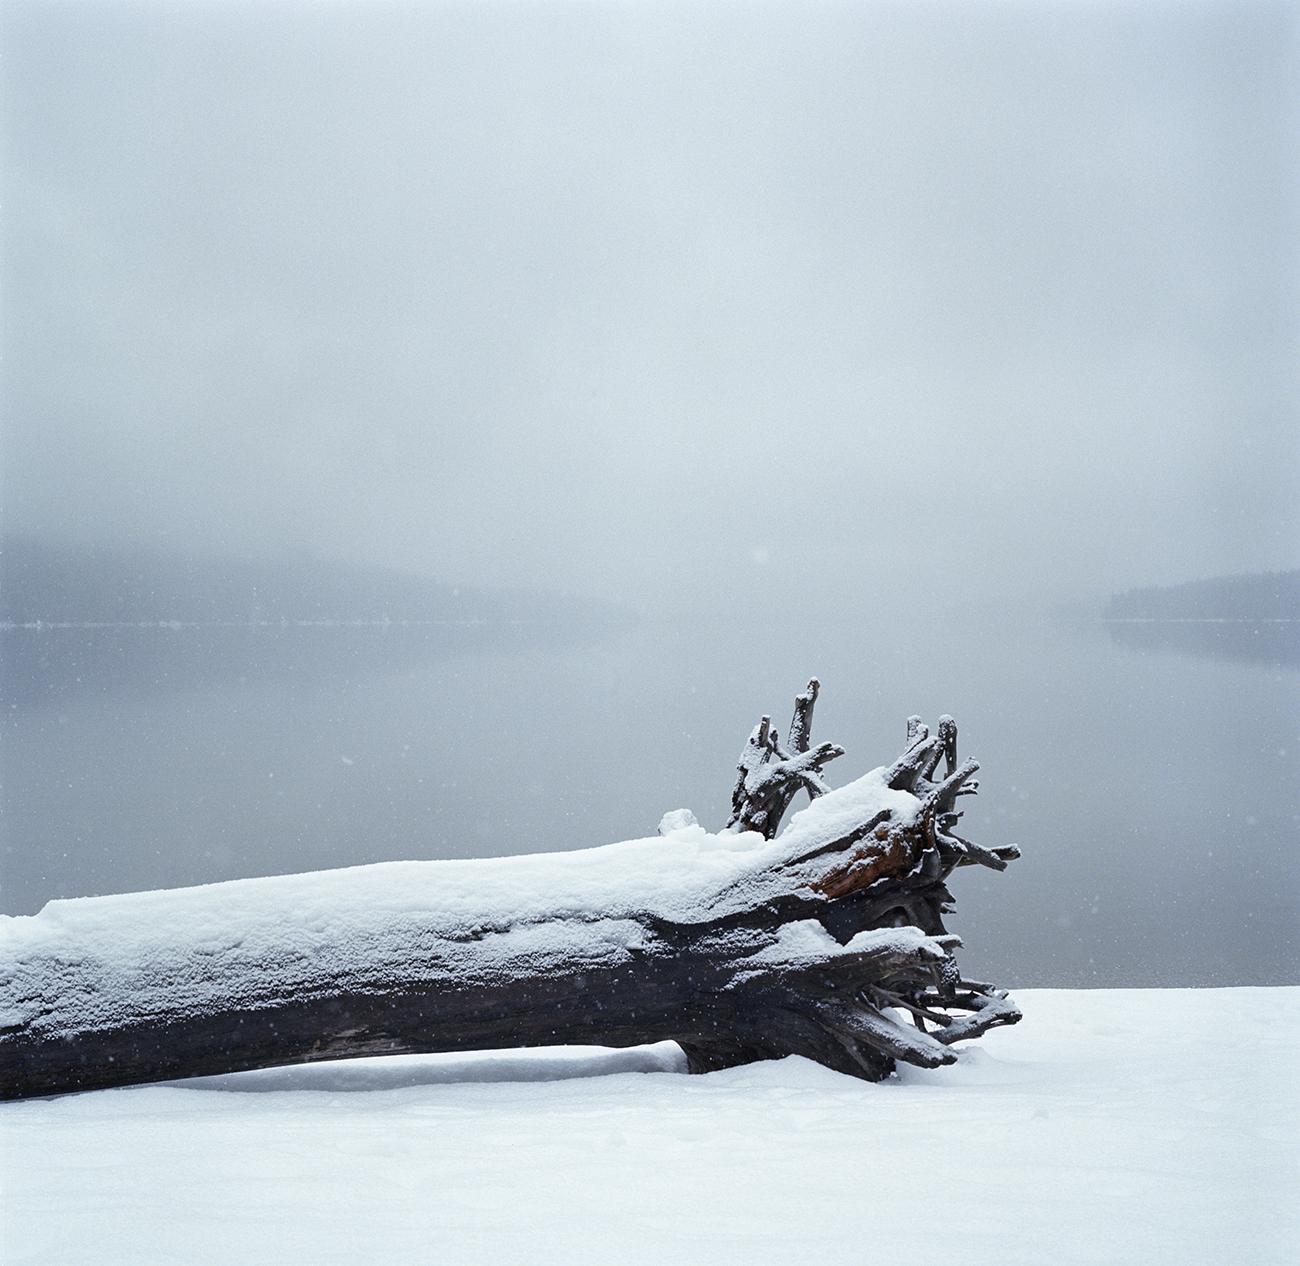 lake wenatchee fallen tree hblad.jpg